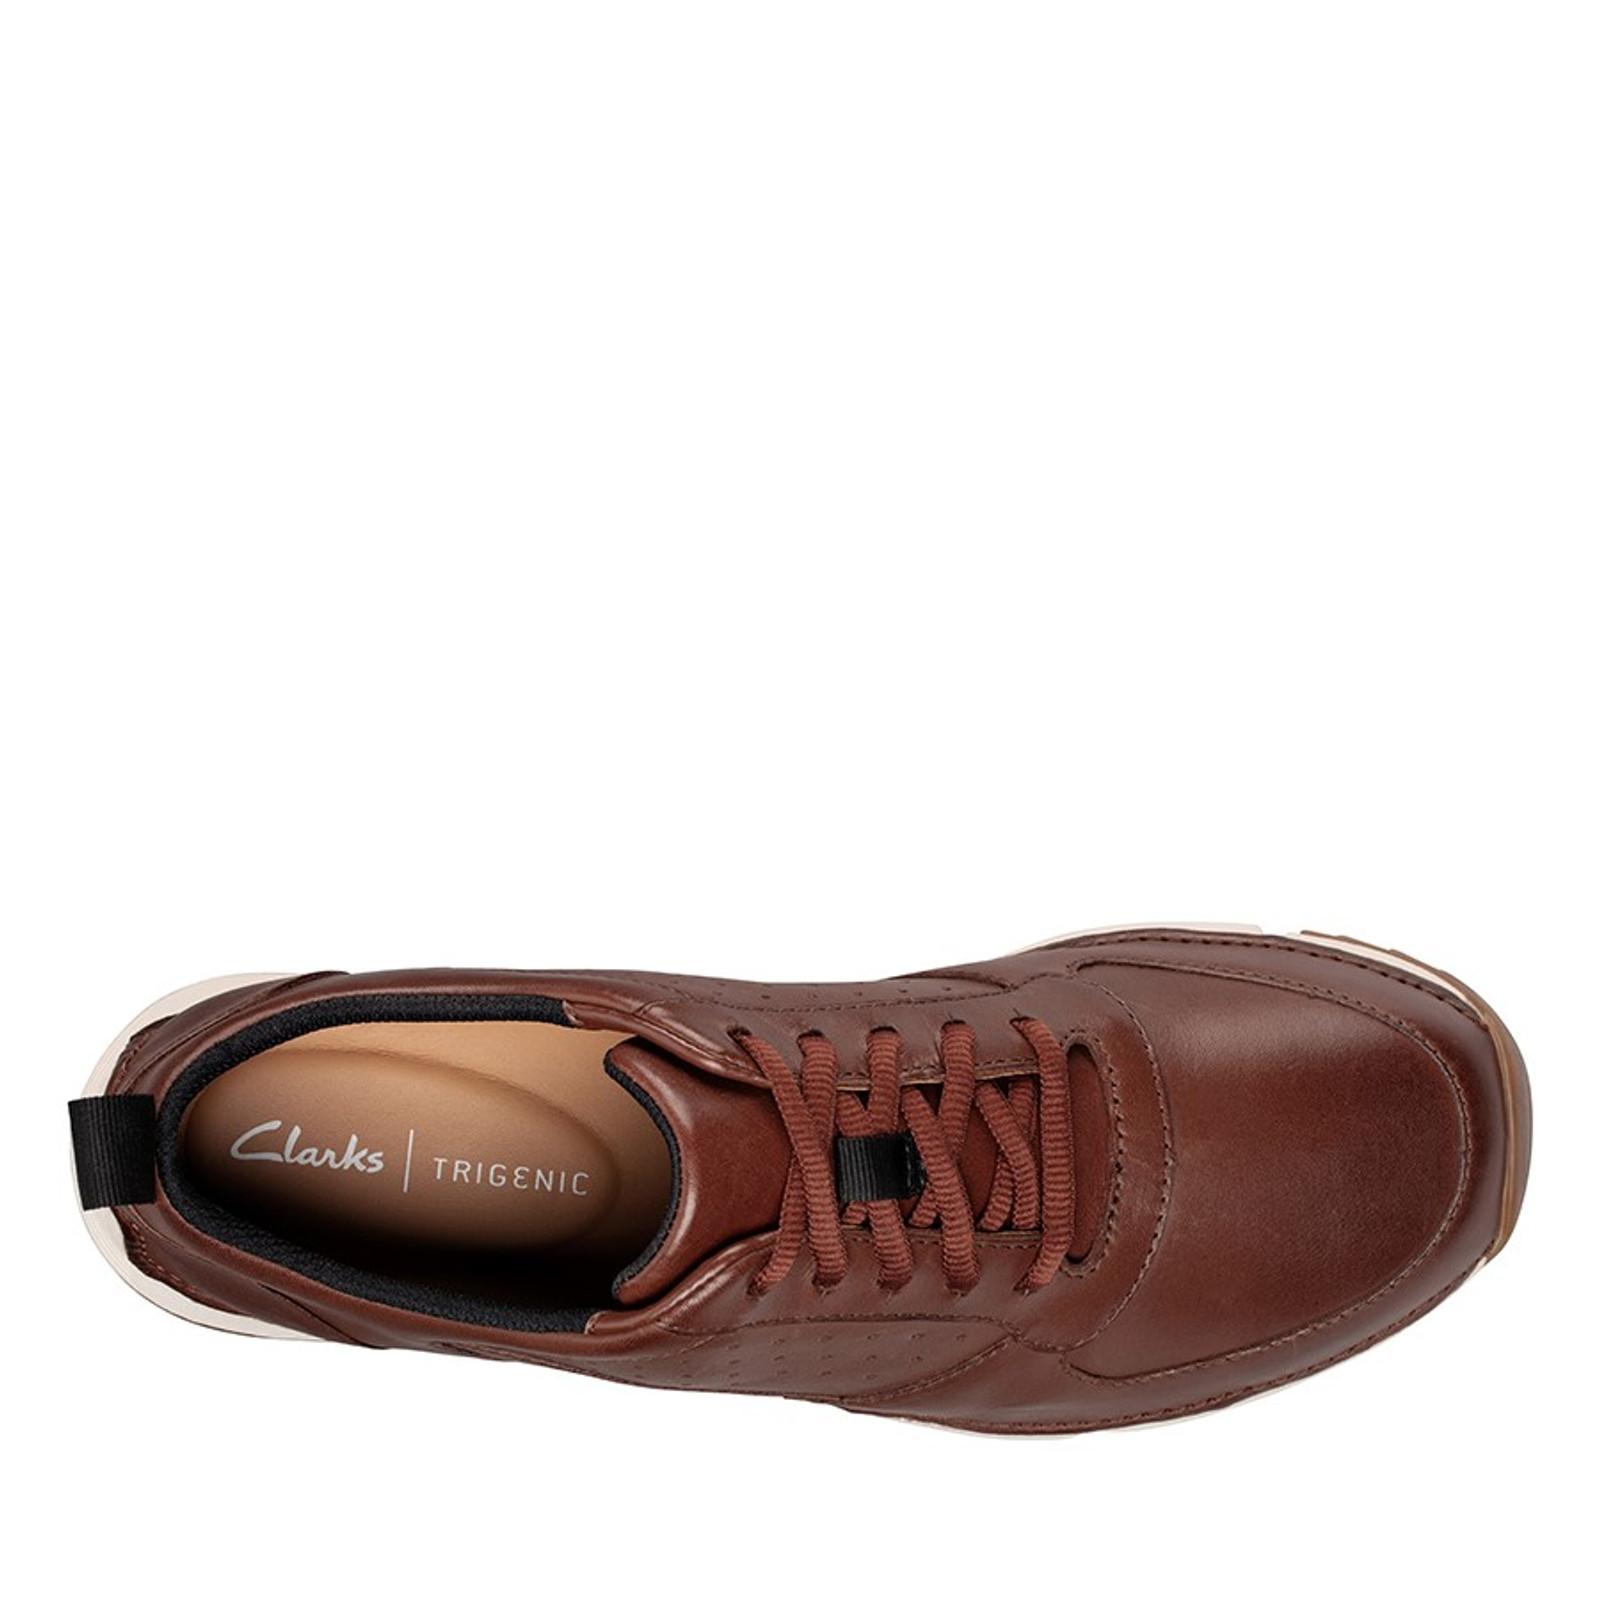 Clarks Mens TRI SPRINT British Tan Leather